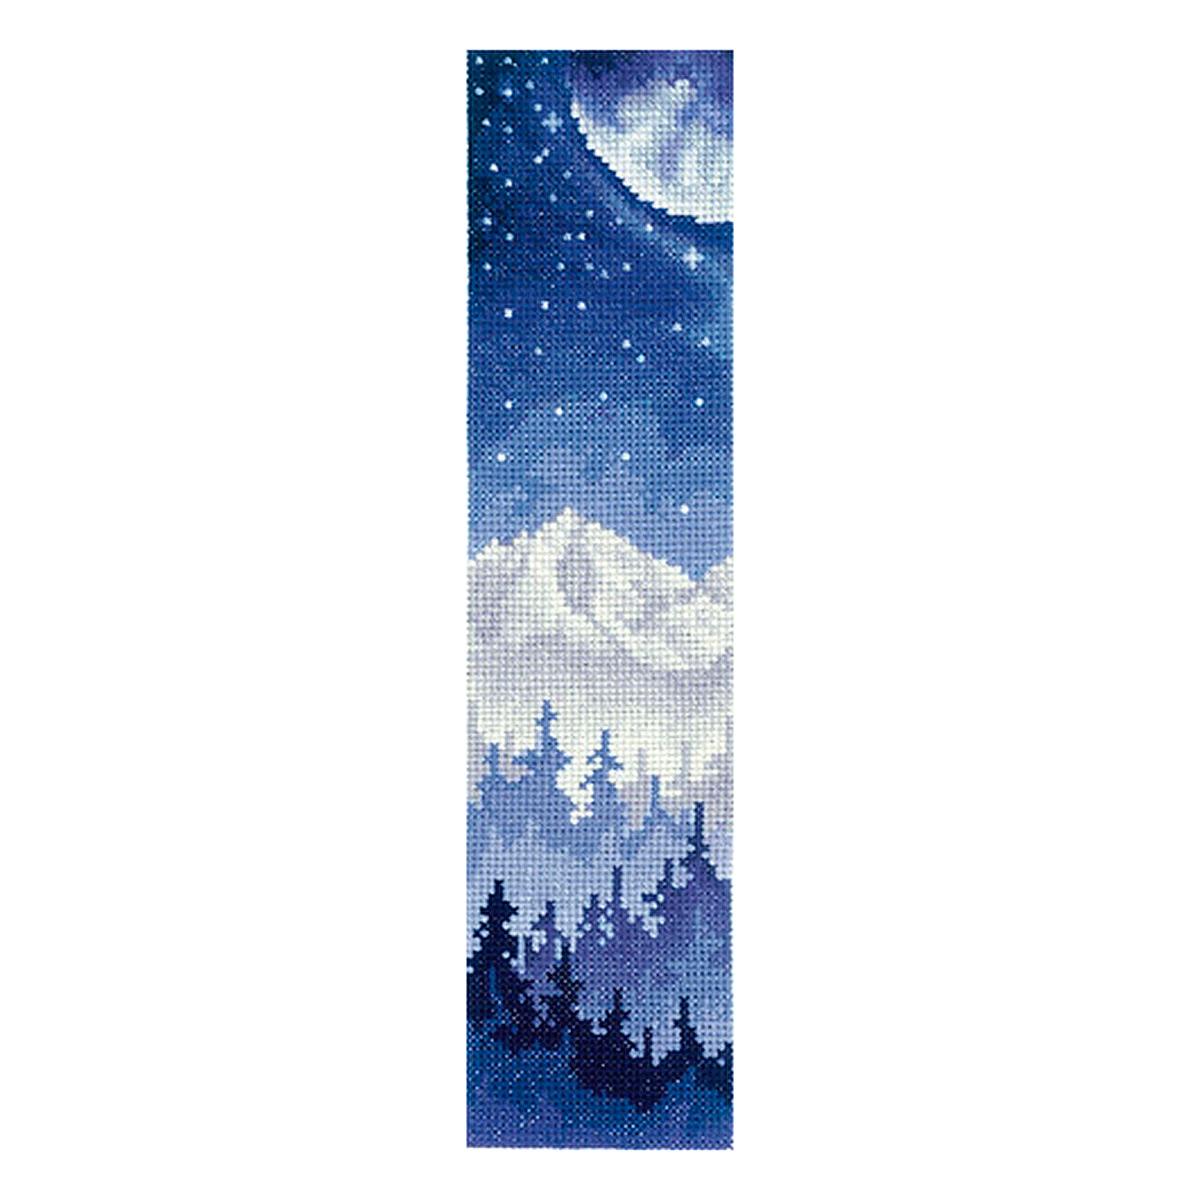 З-48 Набор для вышивания 'Закладки. Луна над лесом'5,5 х 22см